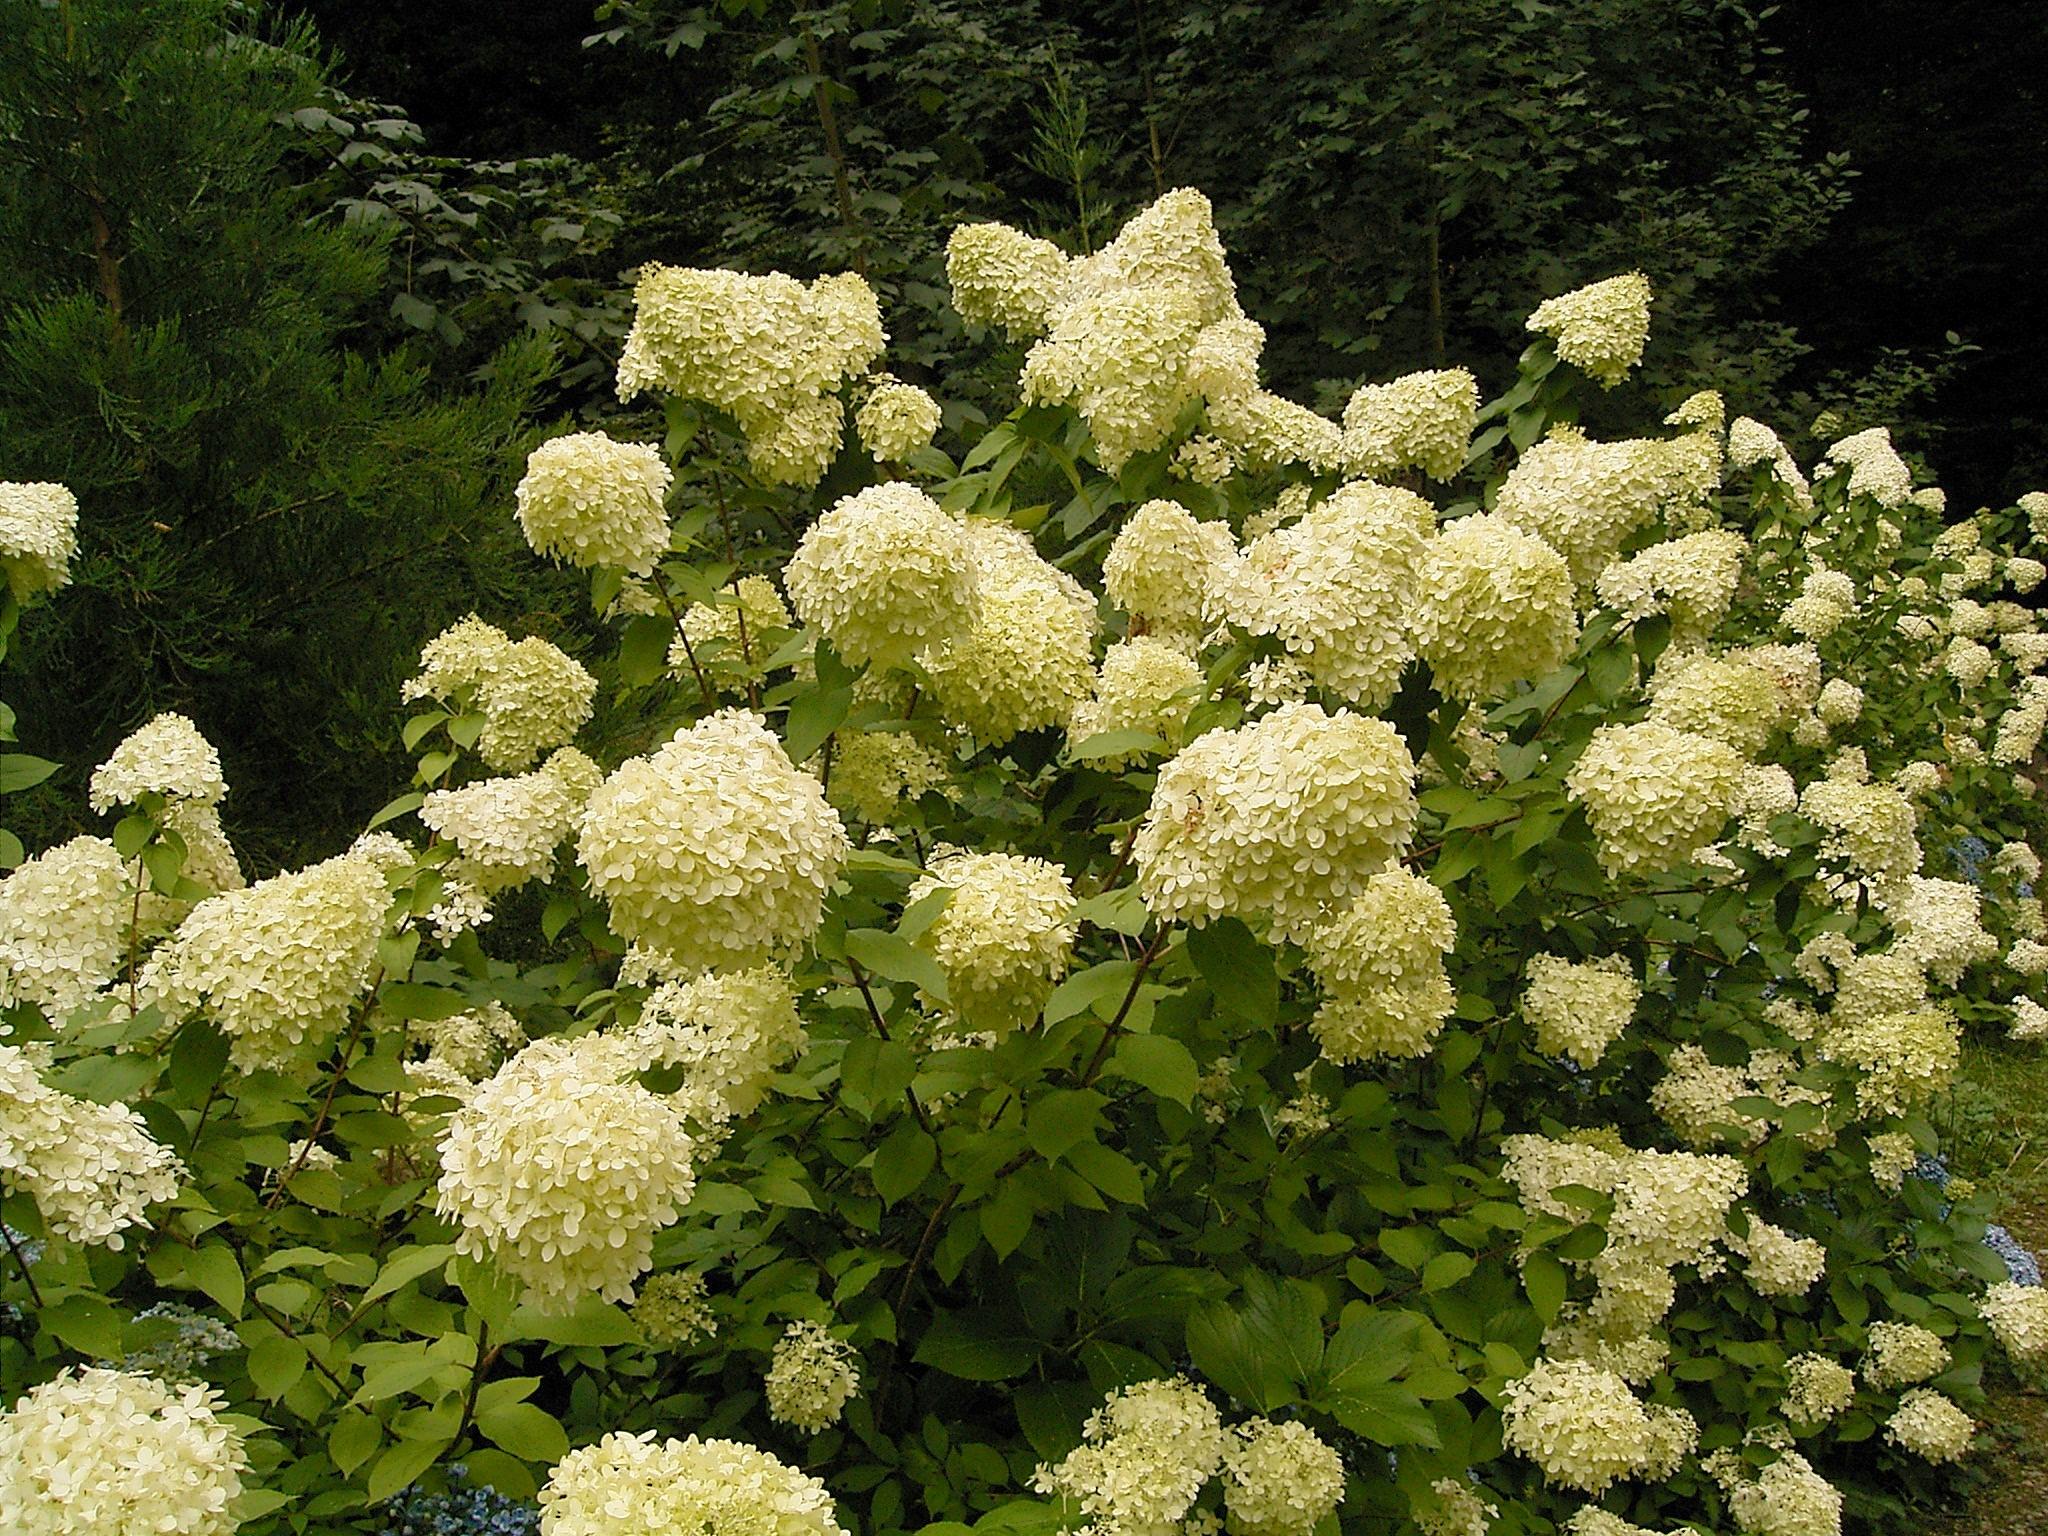 File:Hydrangea paniculata 03 ies.jpg - Wikimedia Commons